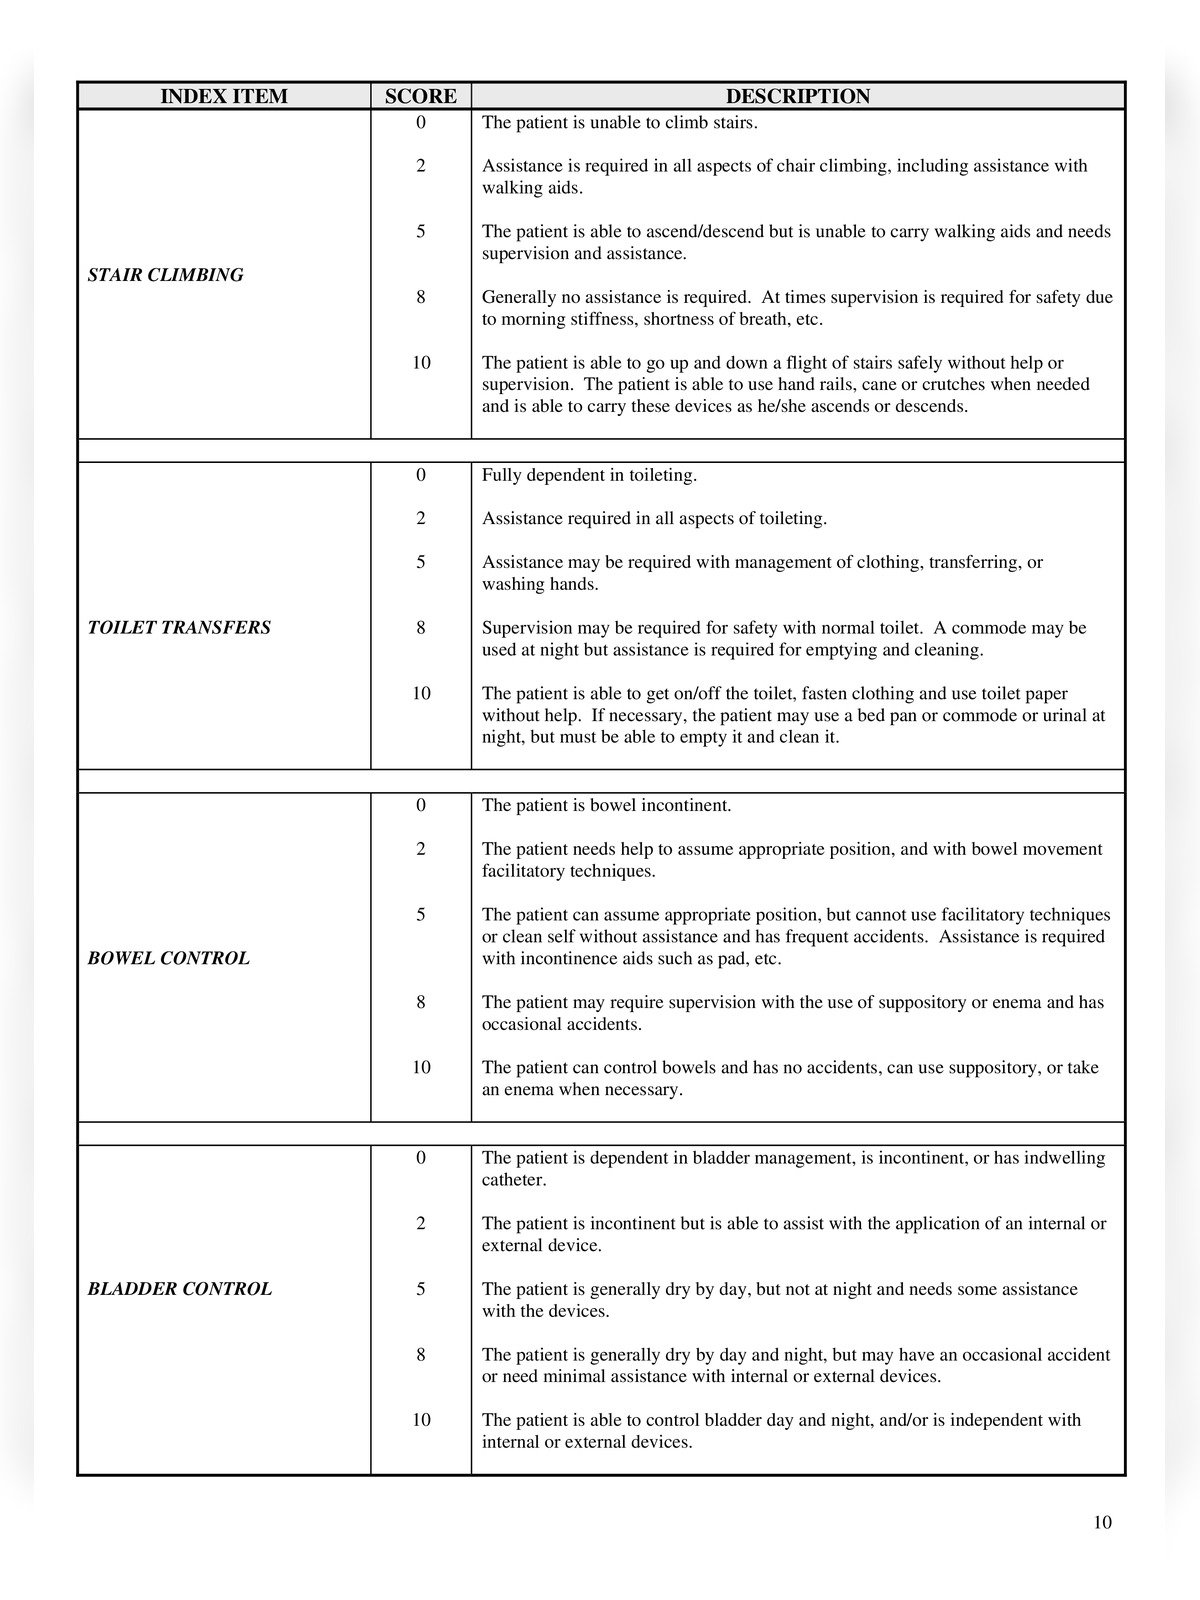 Modified Barthel Index pdf